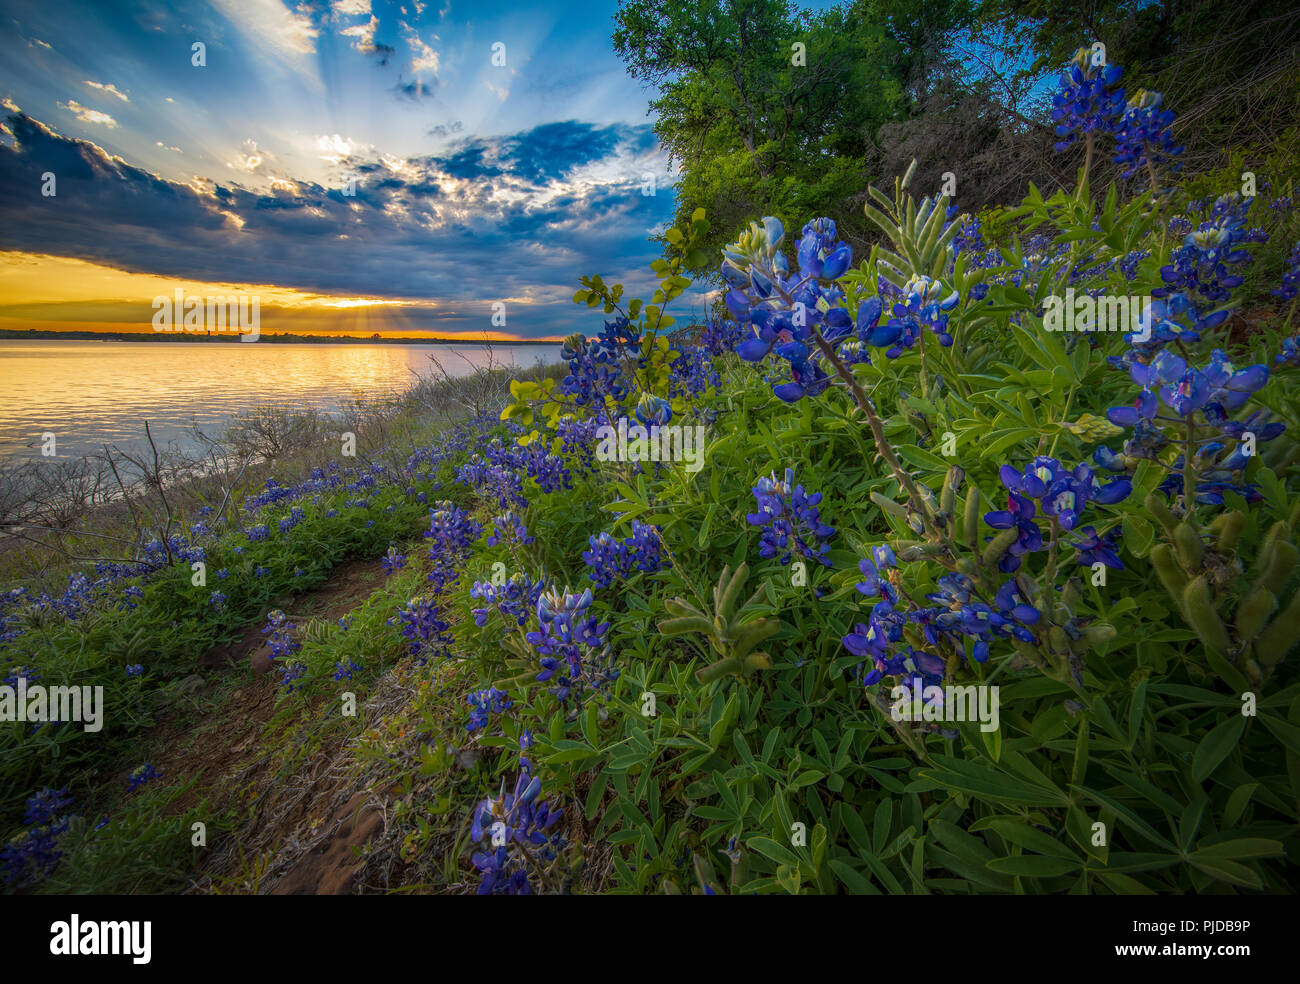 En el Lago Grapevine Bluebonnets en el norte de Texas. Lupinus texensis, el Texas bluebonnet, es una especie endémica de lupino a Texas. Imagen De Stock